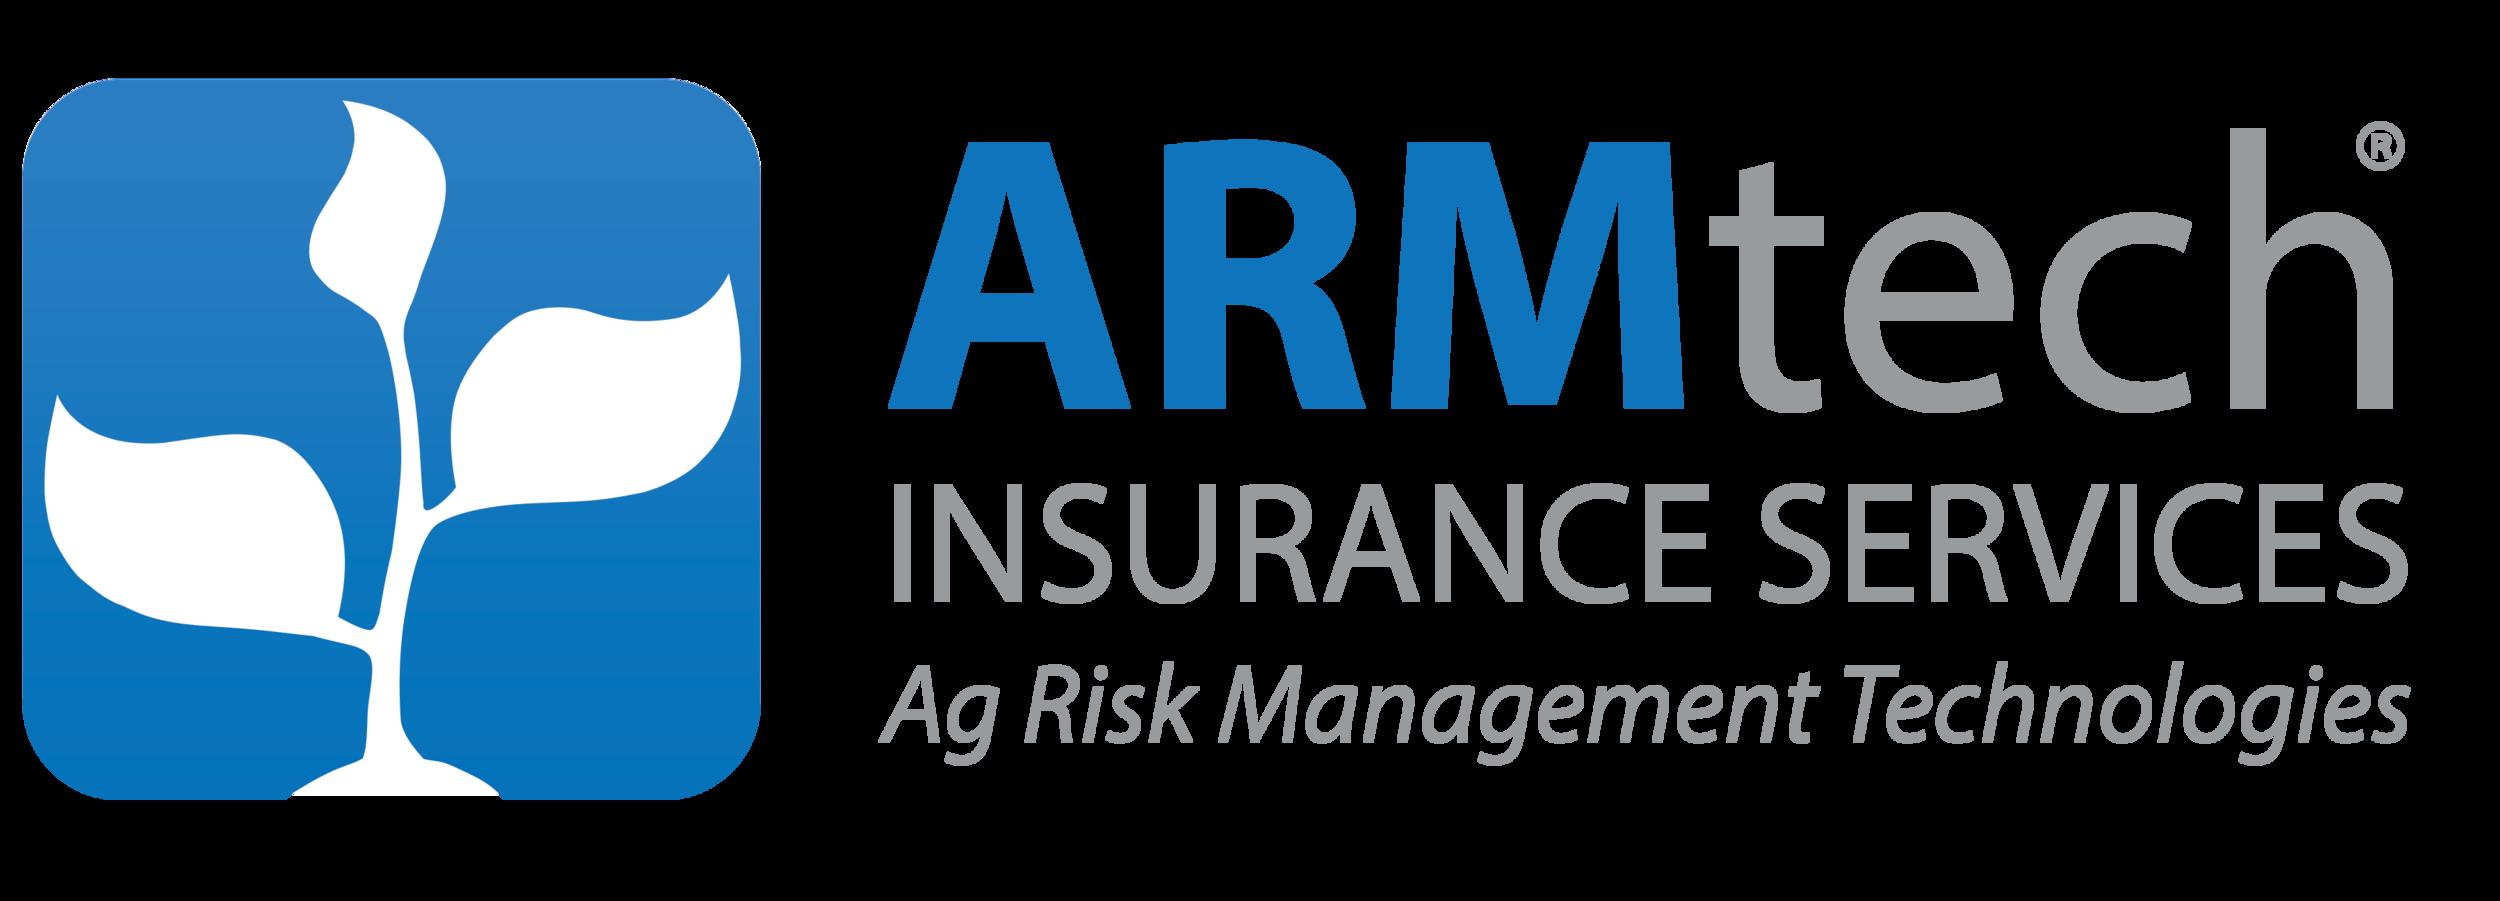 ARMtech-Logo_full.png